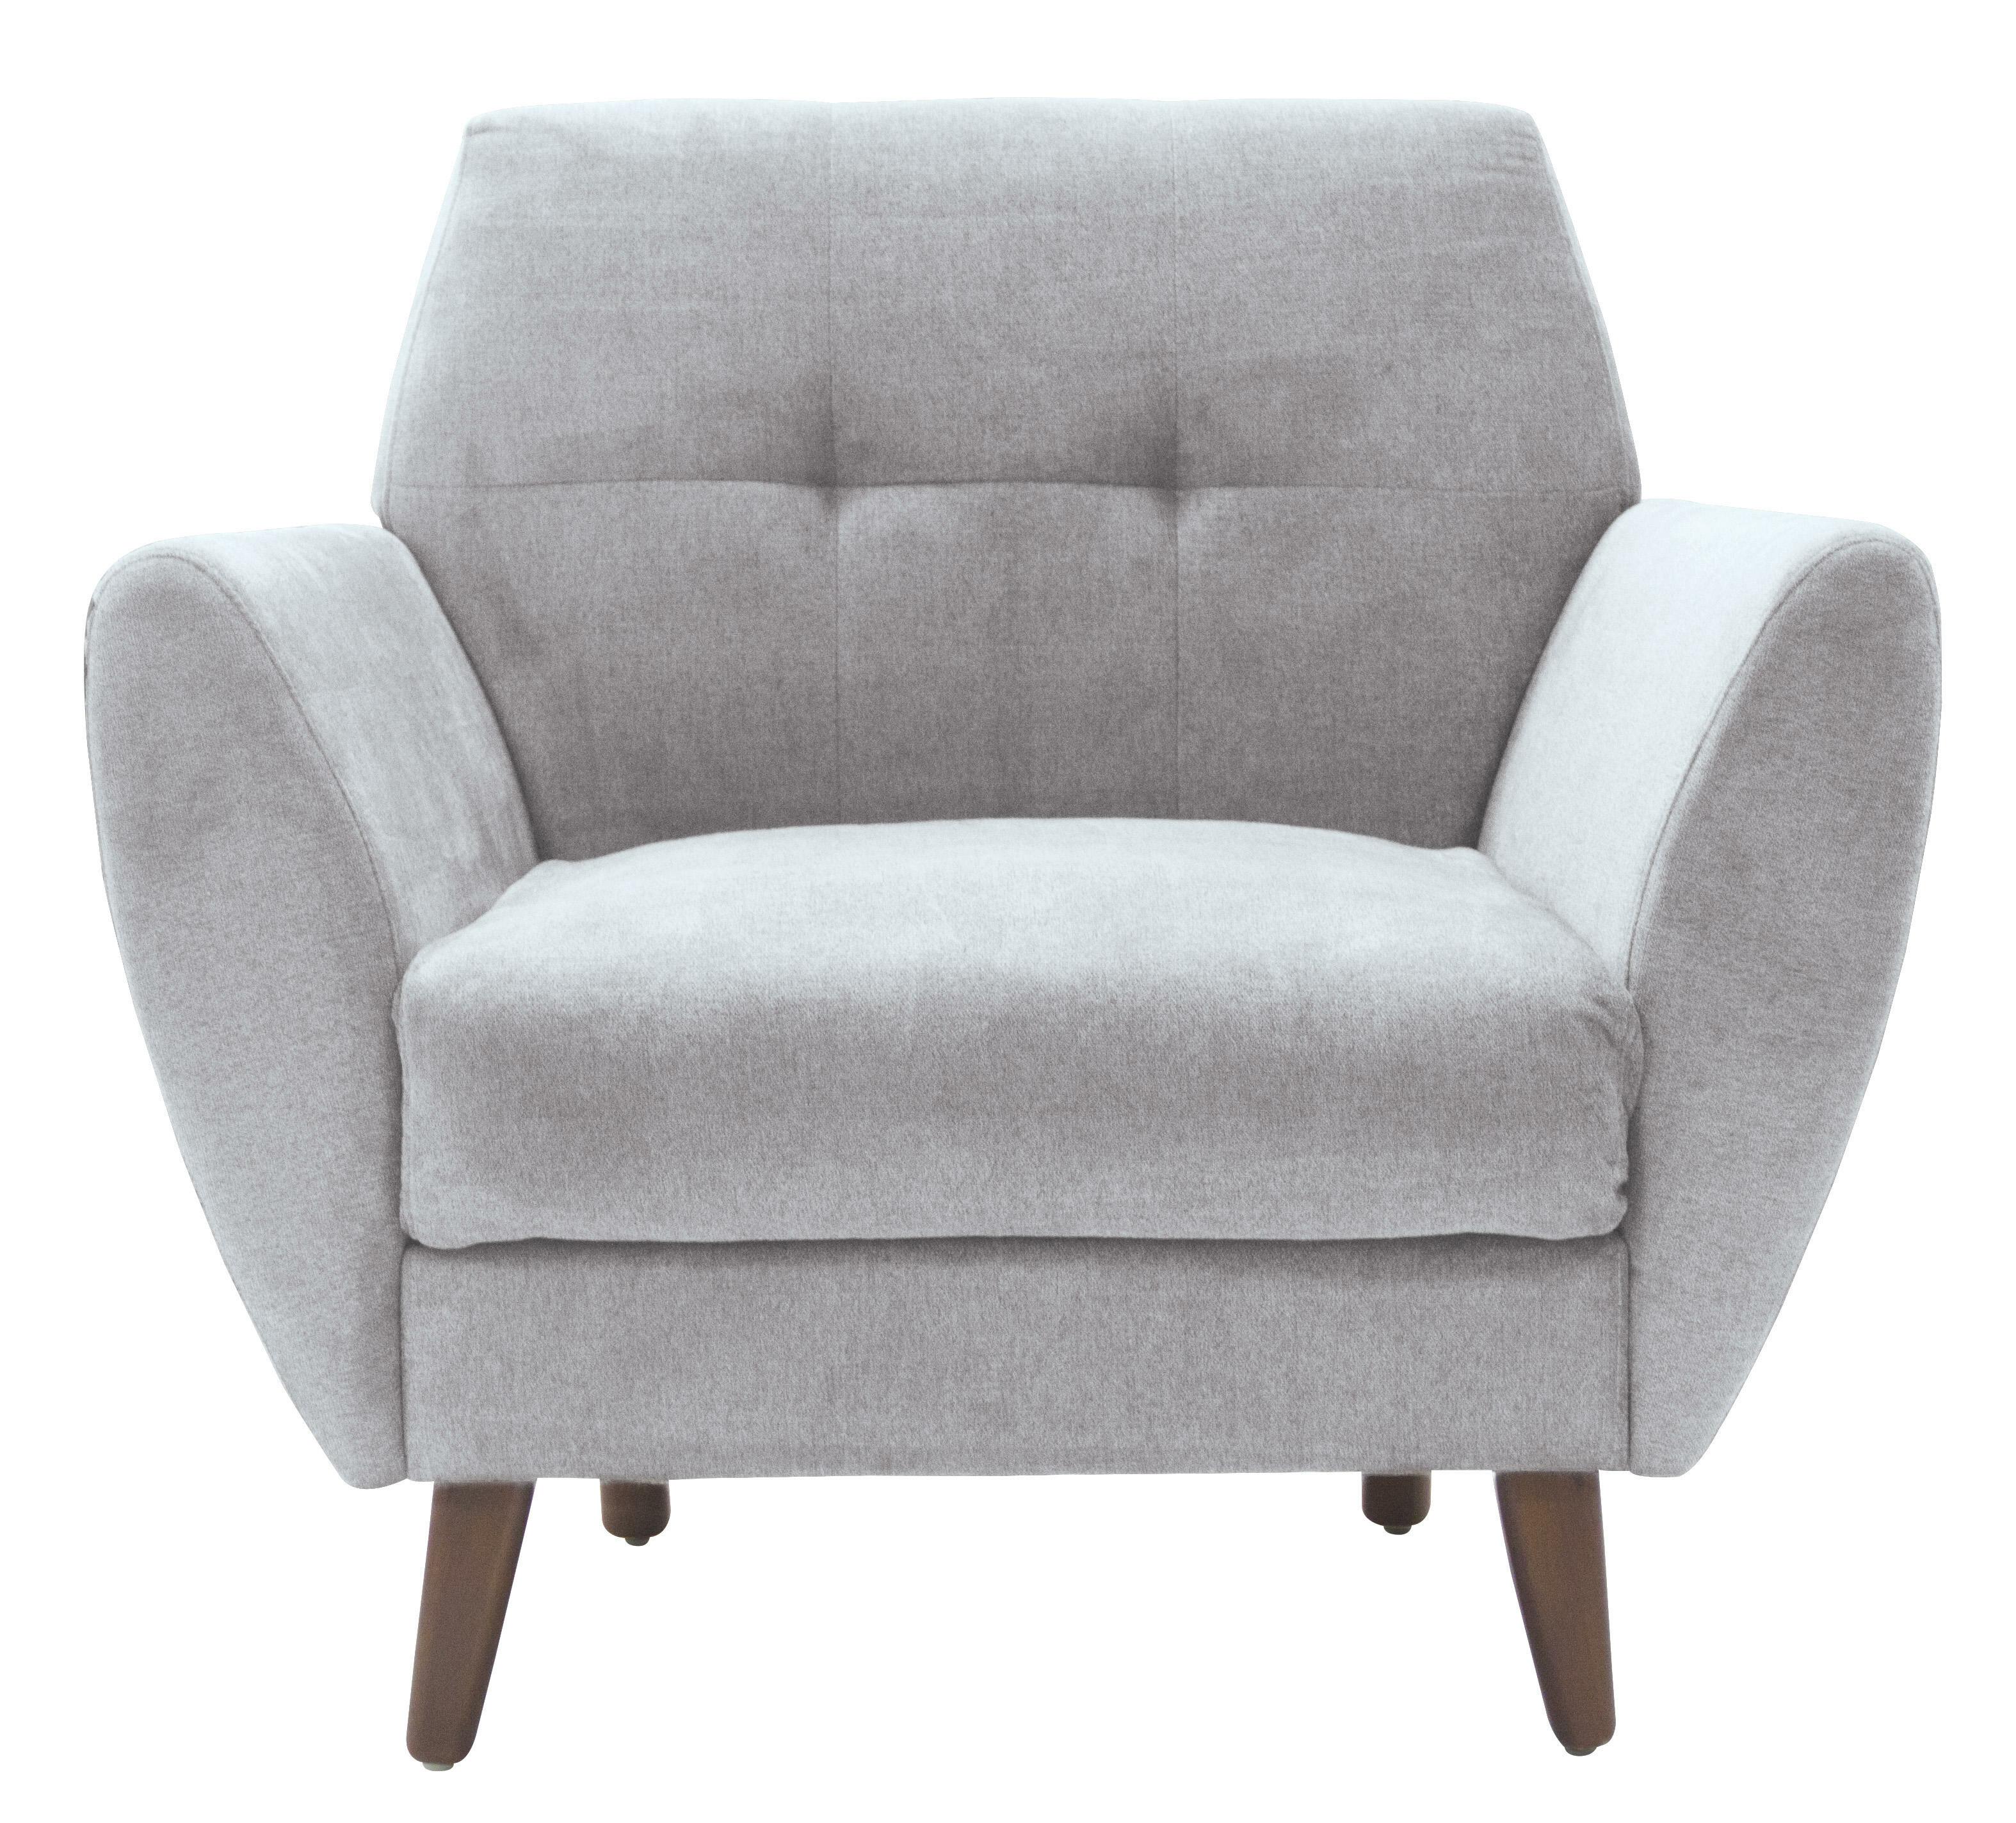 Elle Decor Amelie Mid Century Modern Armchair U0026 Reviews | Wayfair